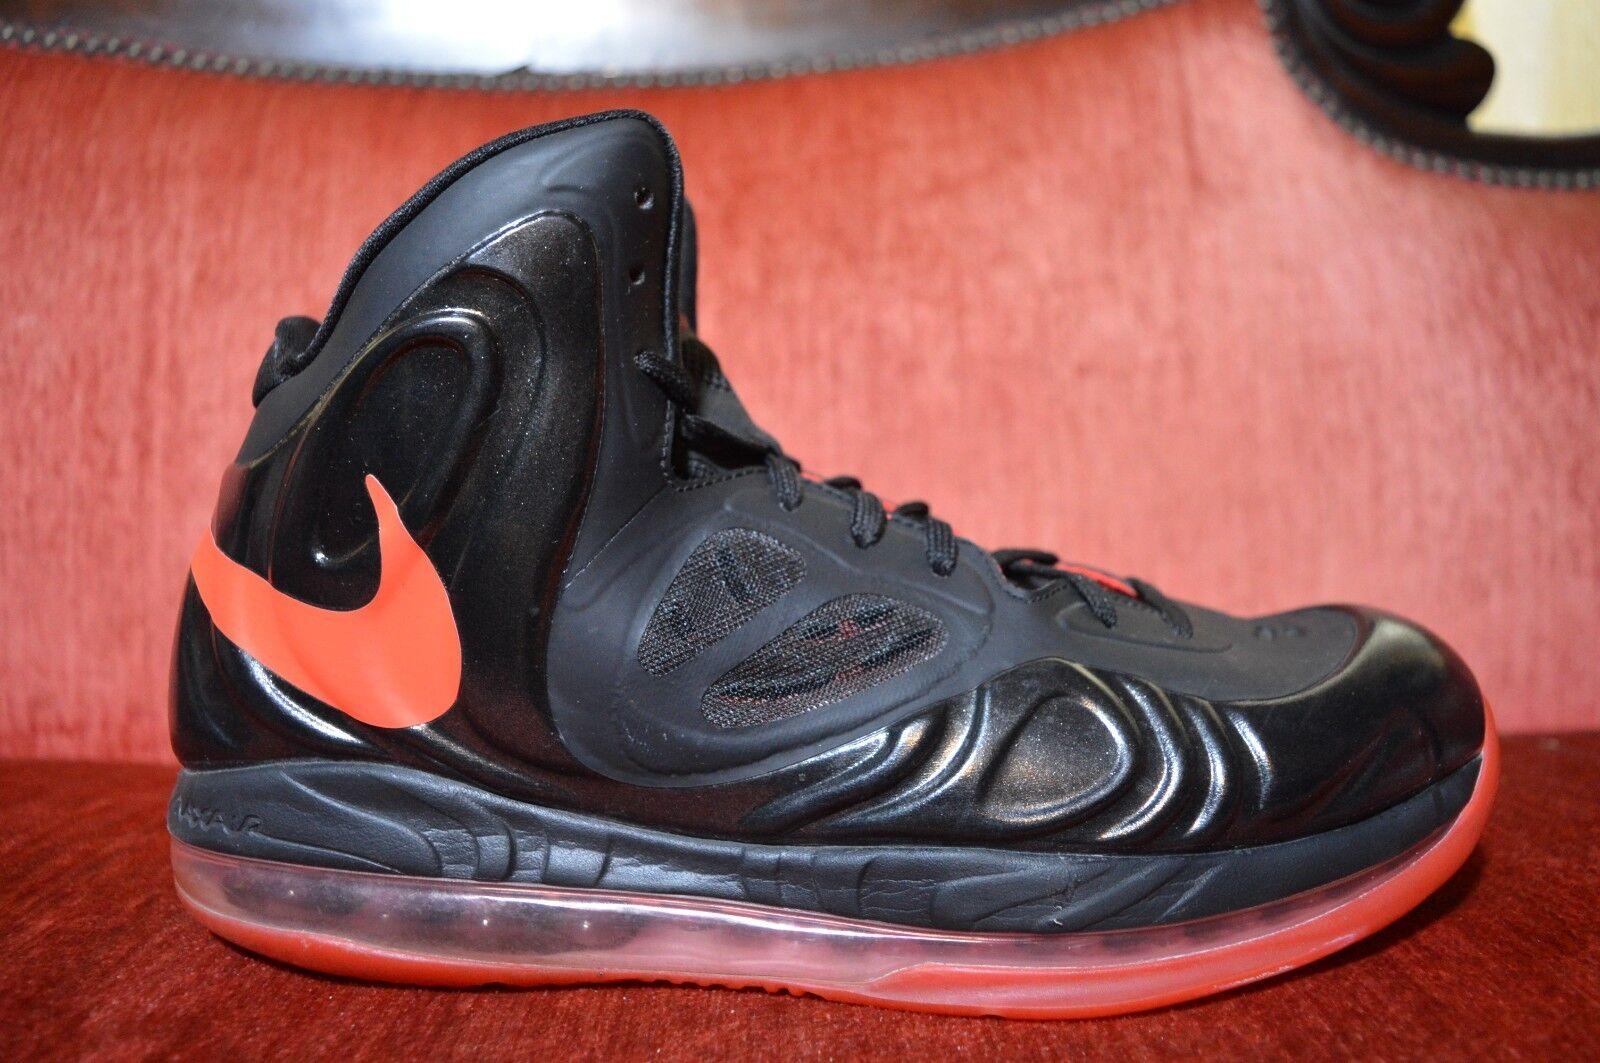 66733fe5817e ... Nike Air Max Black Hyperposite 524862-002 Black Max and Orange Mens  Size 9 Basketball ...